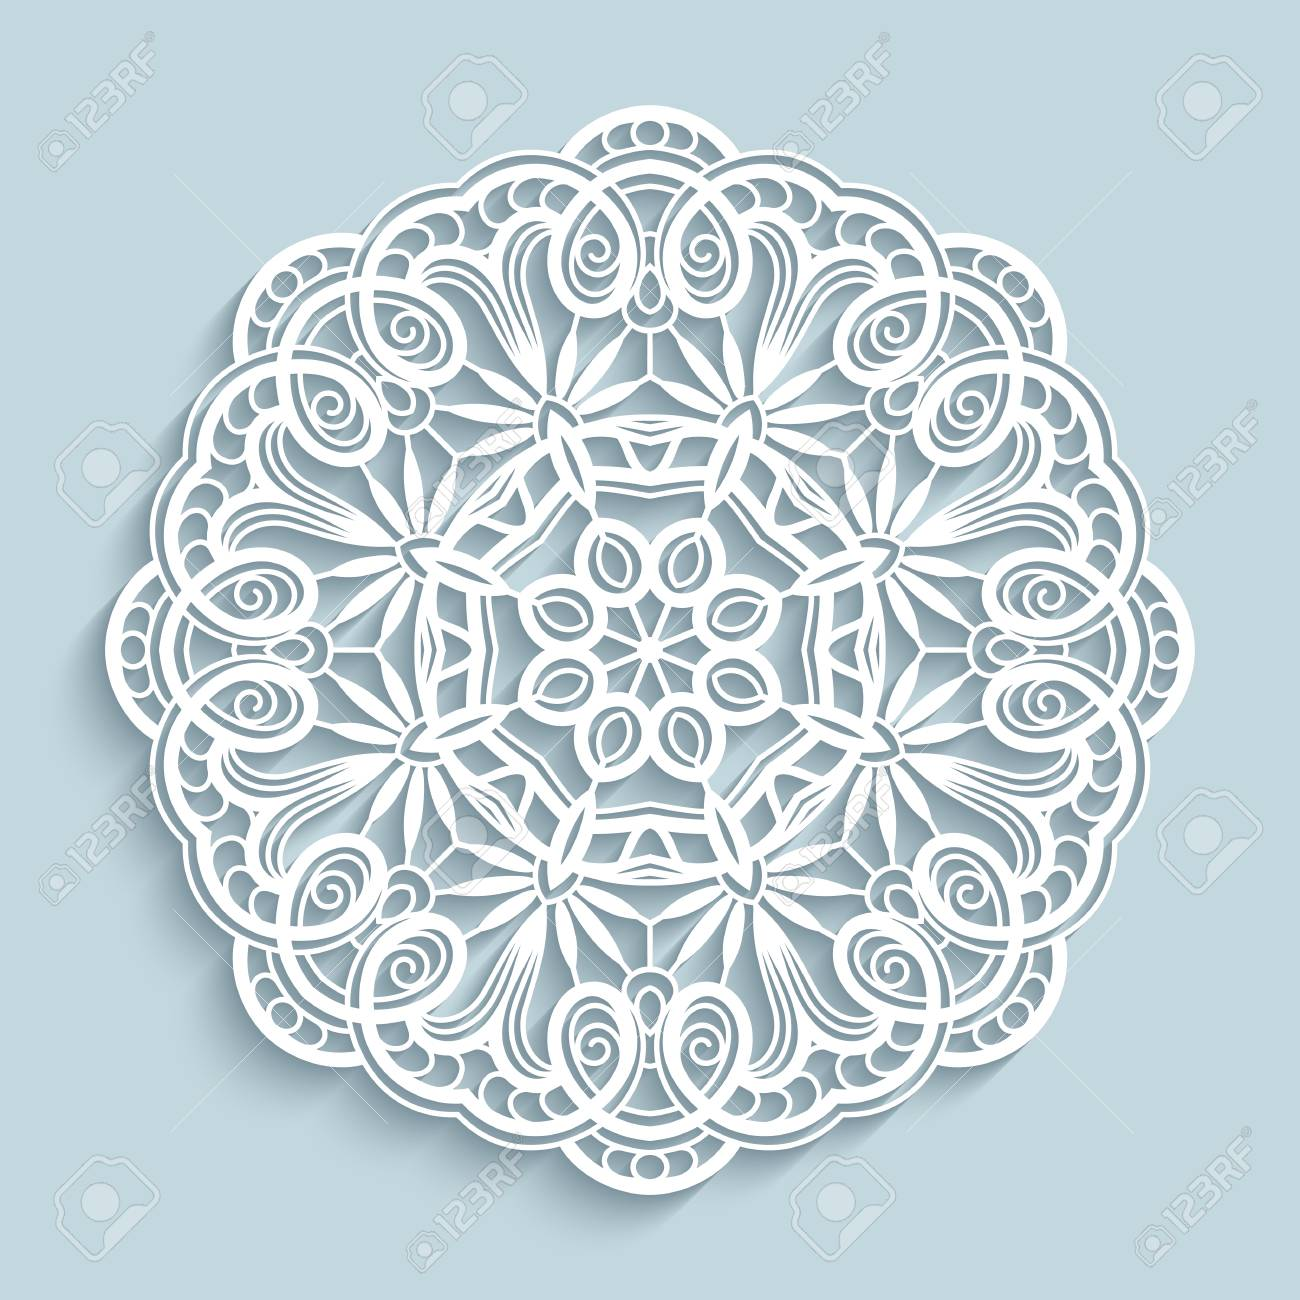 Round Cutout Paper Ornament Lace Doily Decorative Snowflake